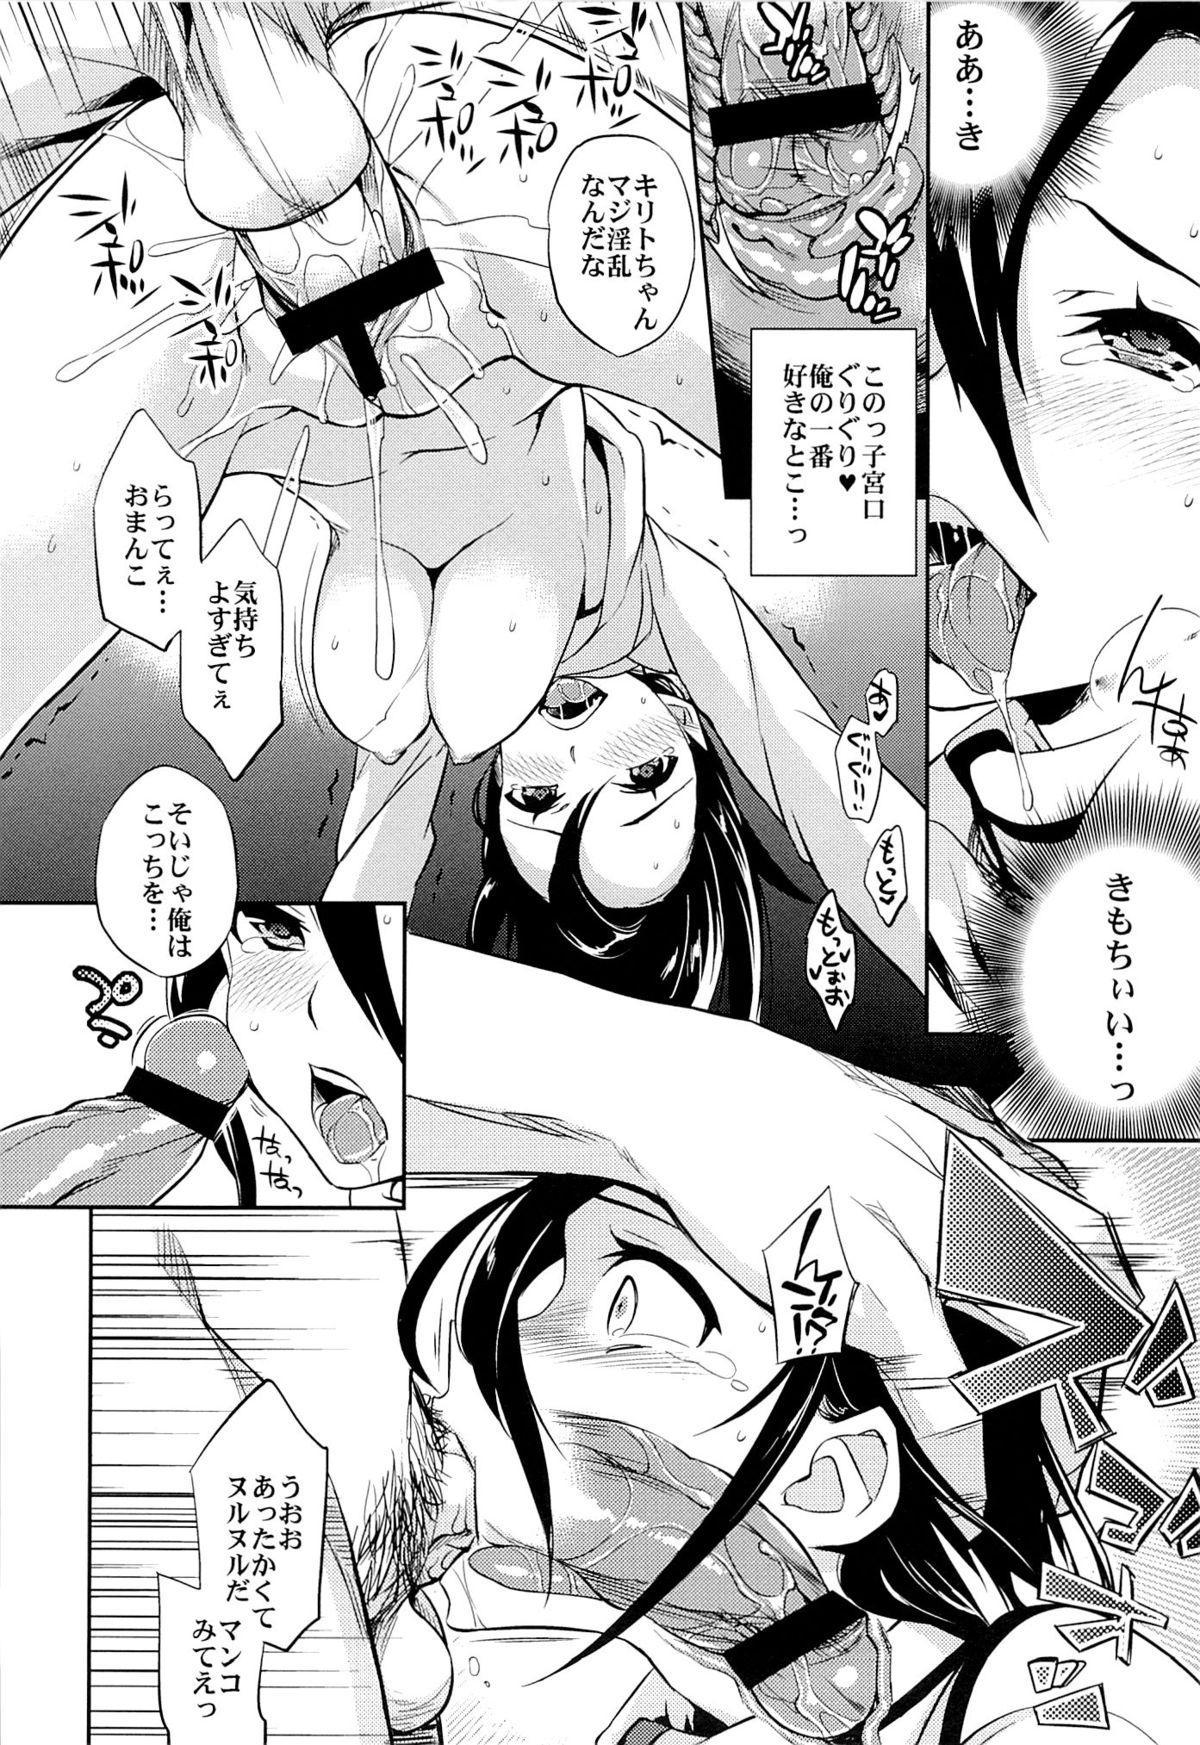 (SC65) [Crazy9 (Ichitaka)] C9-14 TS~Kirito-chan no Avatar wa Random Nyotai (Sword Art Online) 19